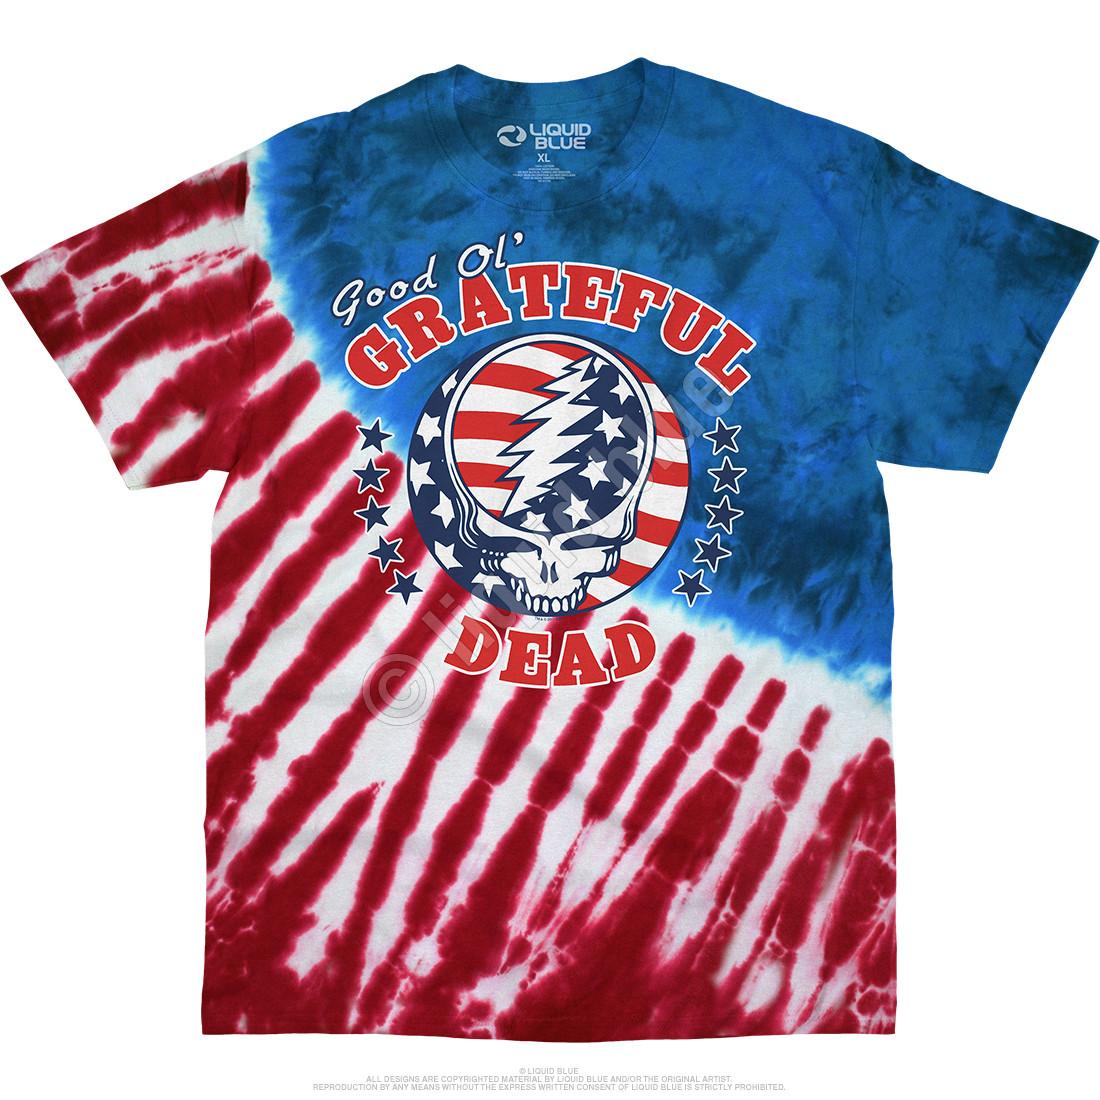 Good Ol GD Tie-Dye T-Shirt